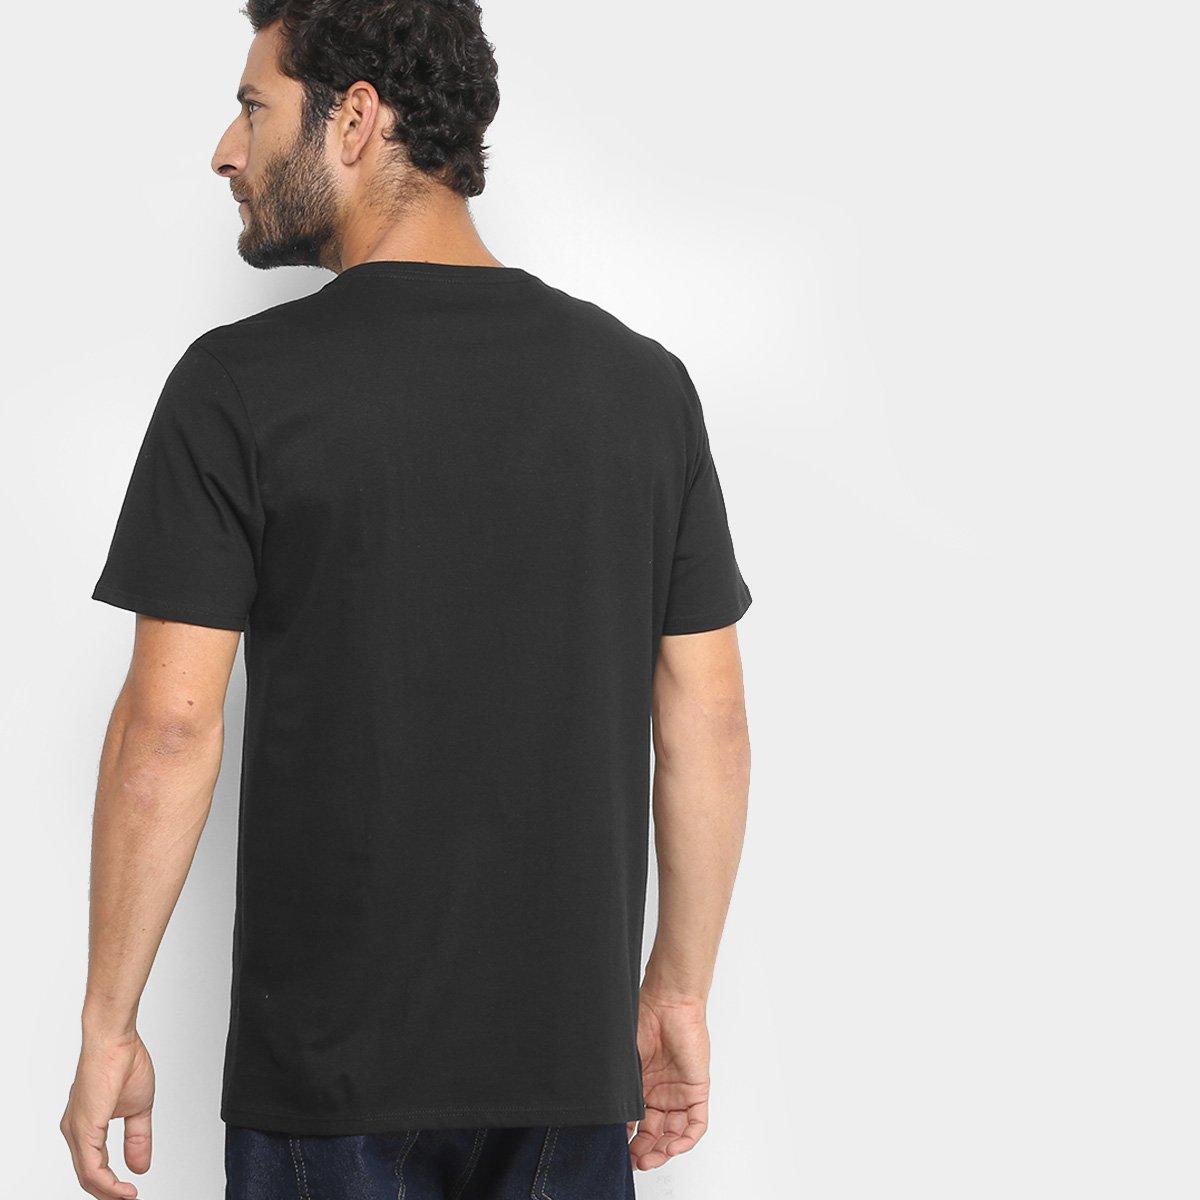 Camiseta Hurley Silk O O Cross Winds Masculina - Compre Agora  cbc936d1e5f